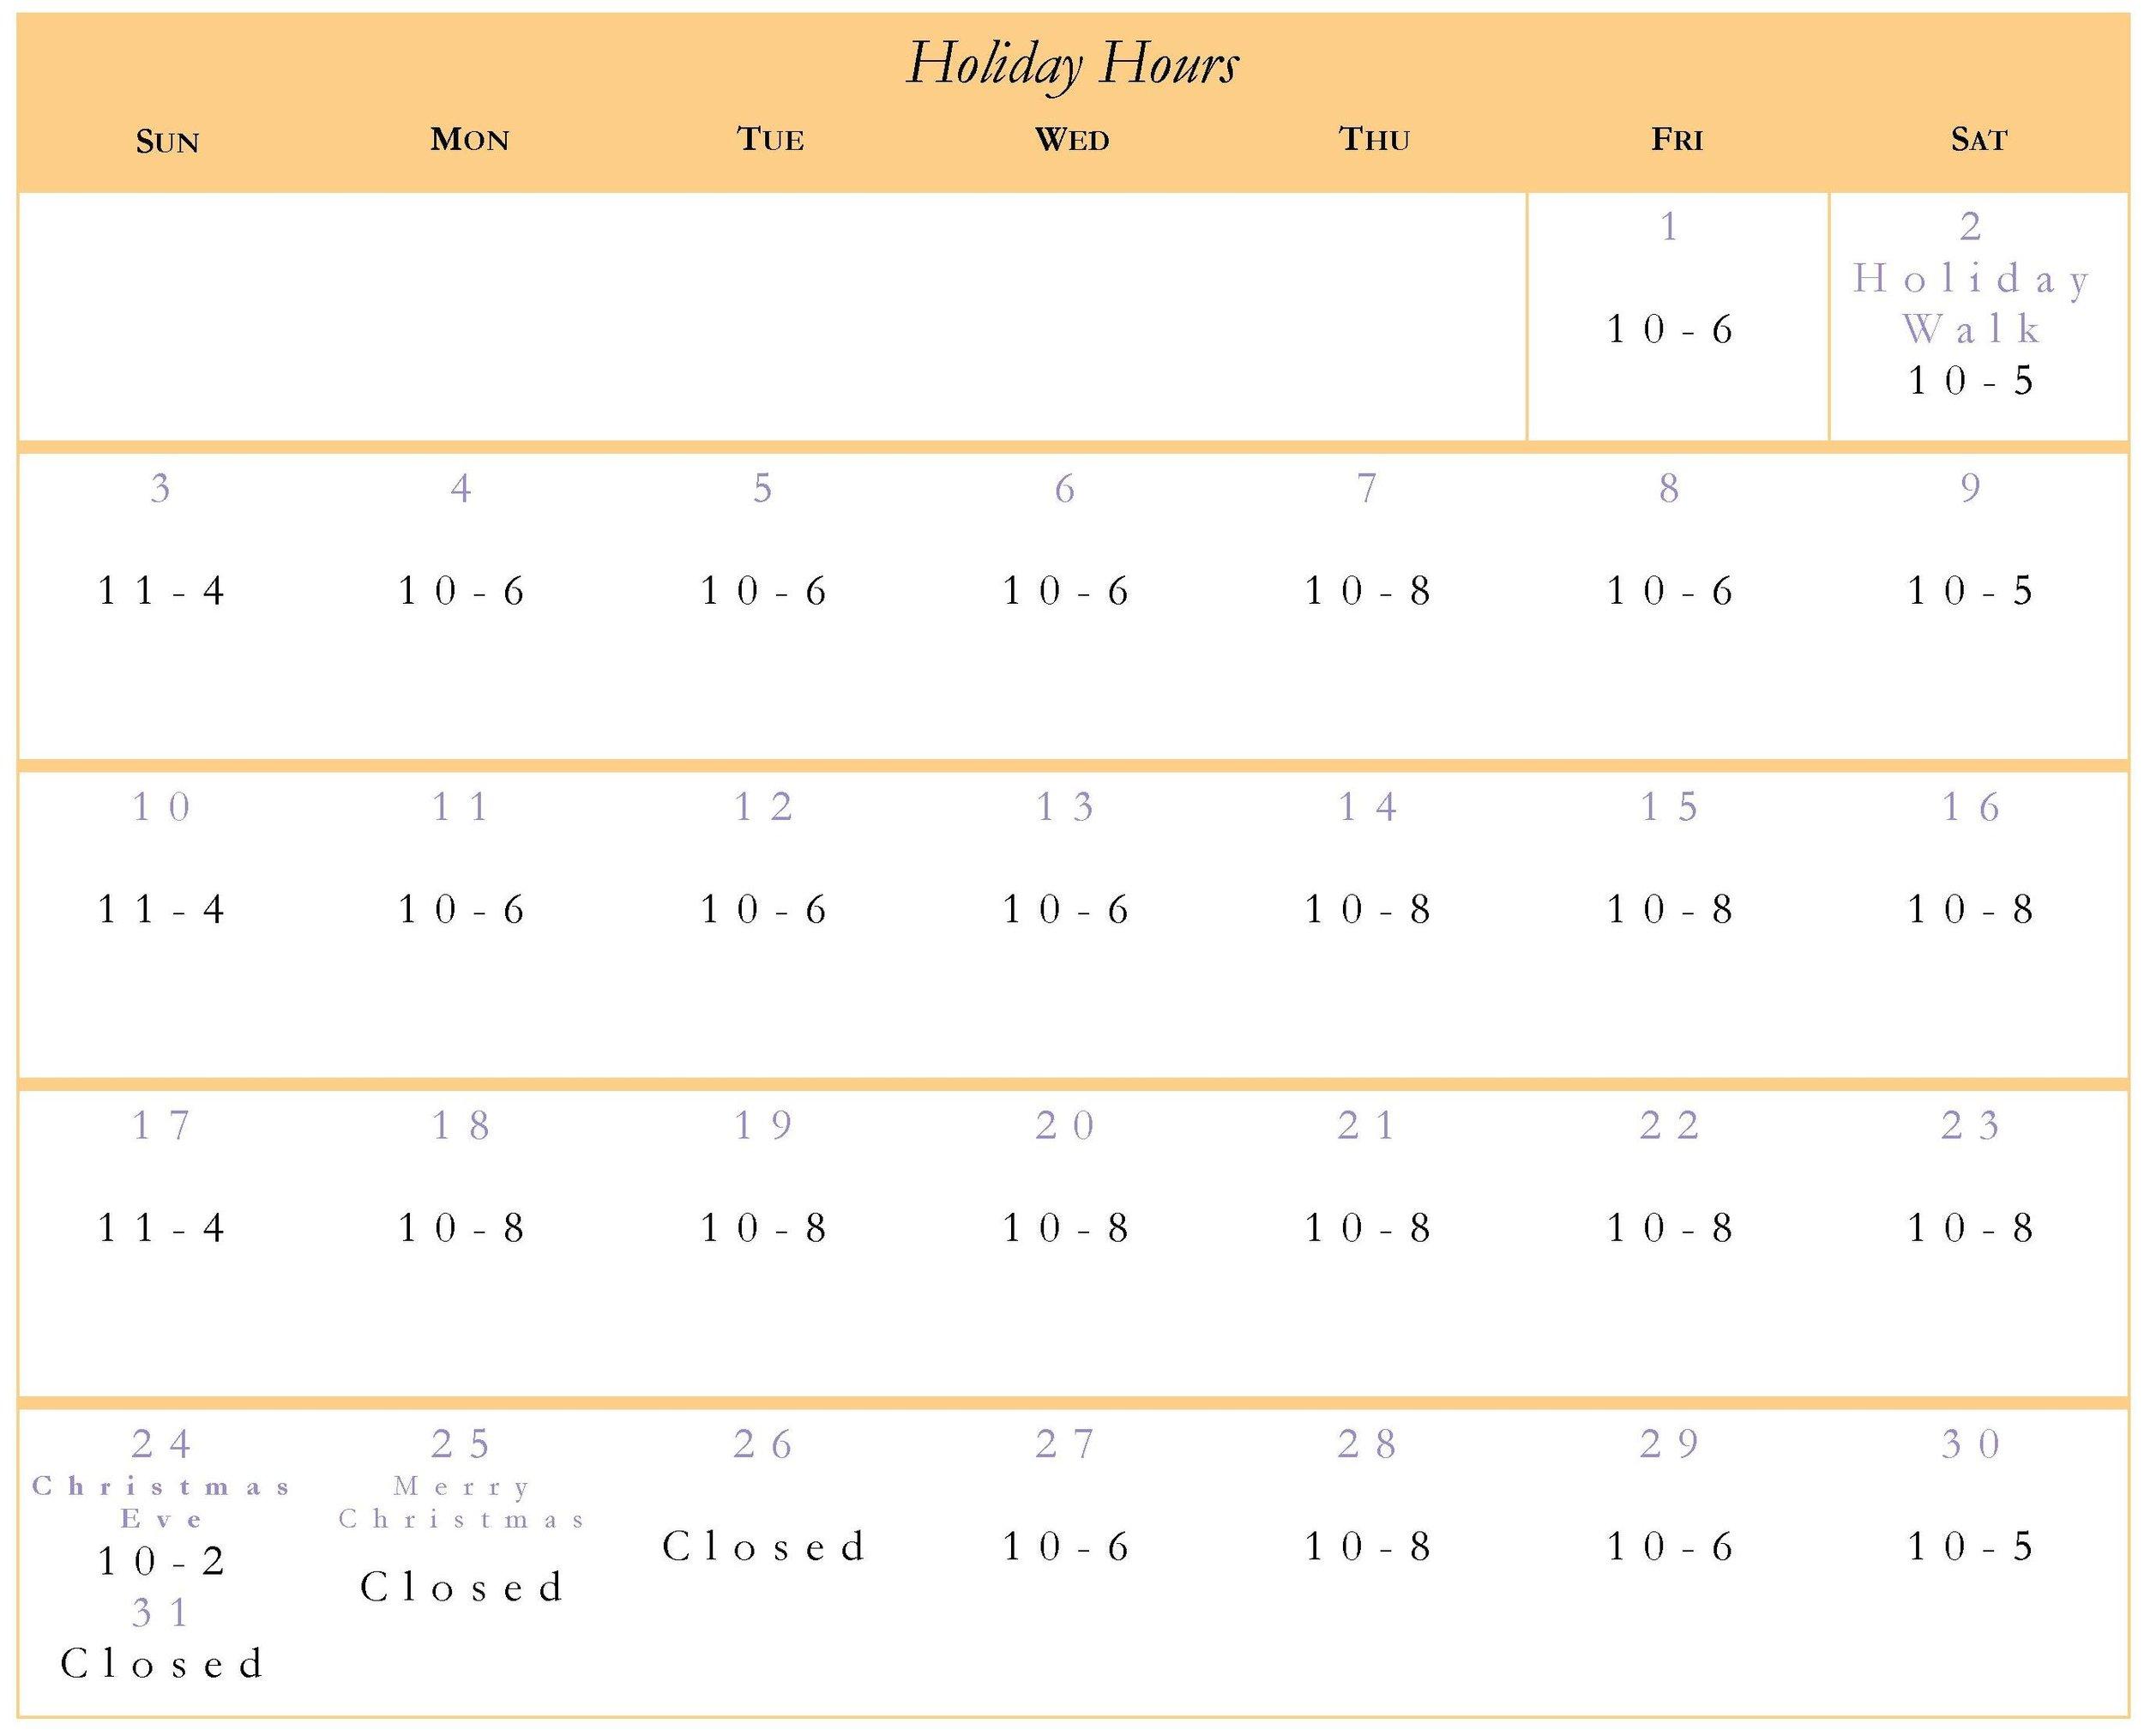 Holiday hours calender.jpg